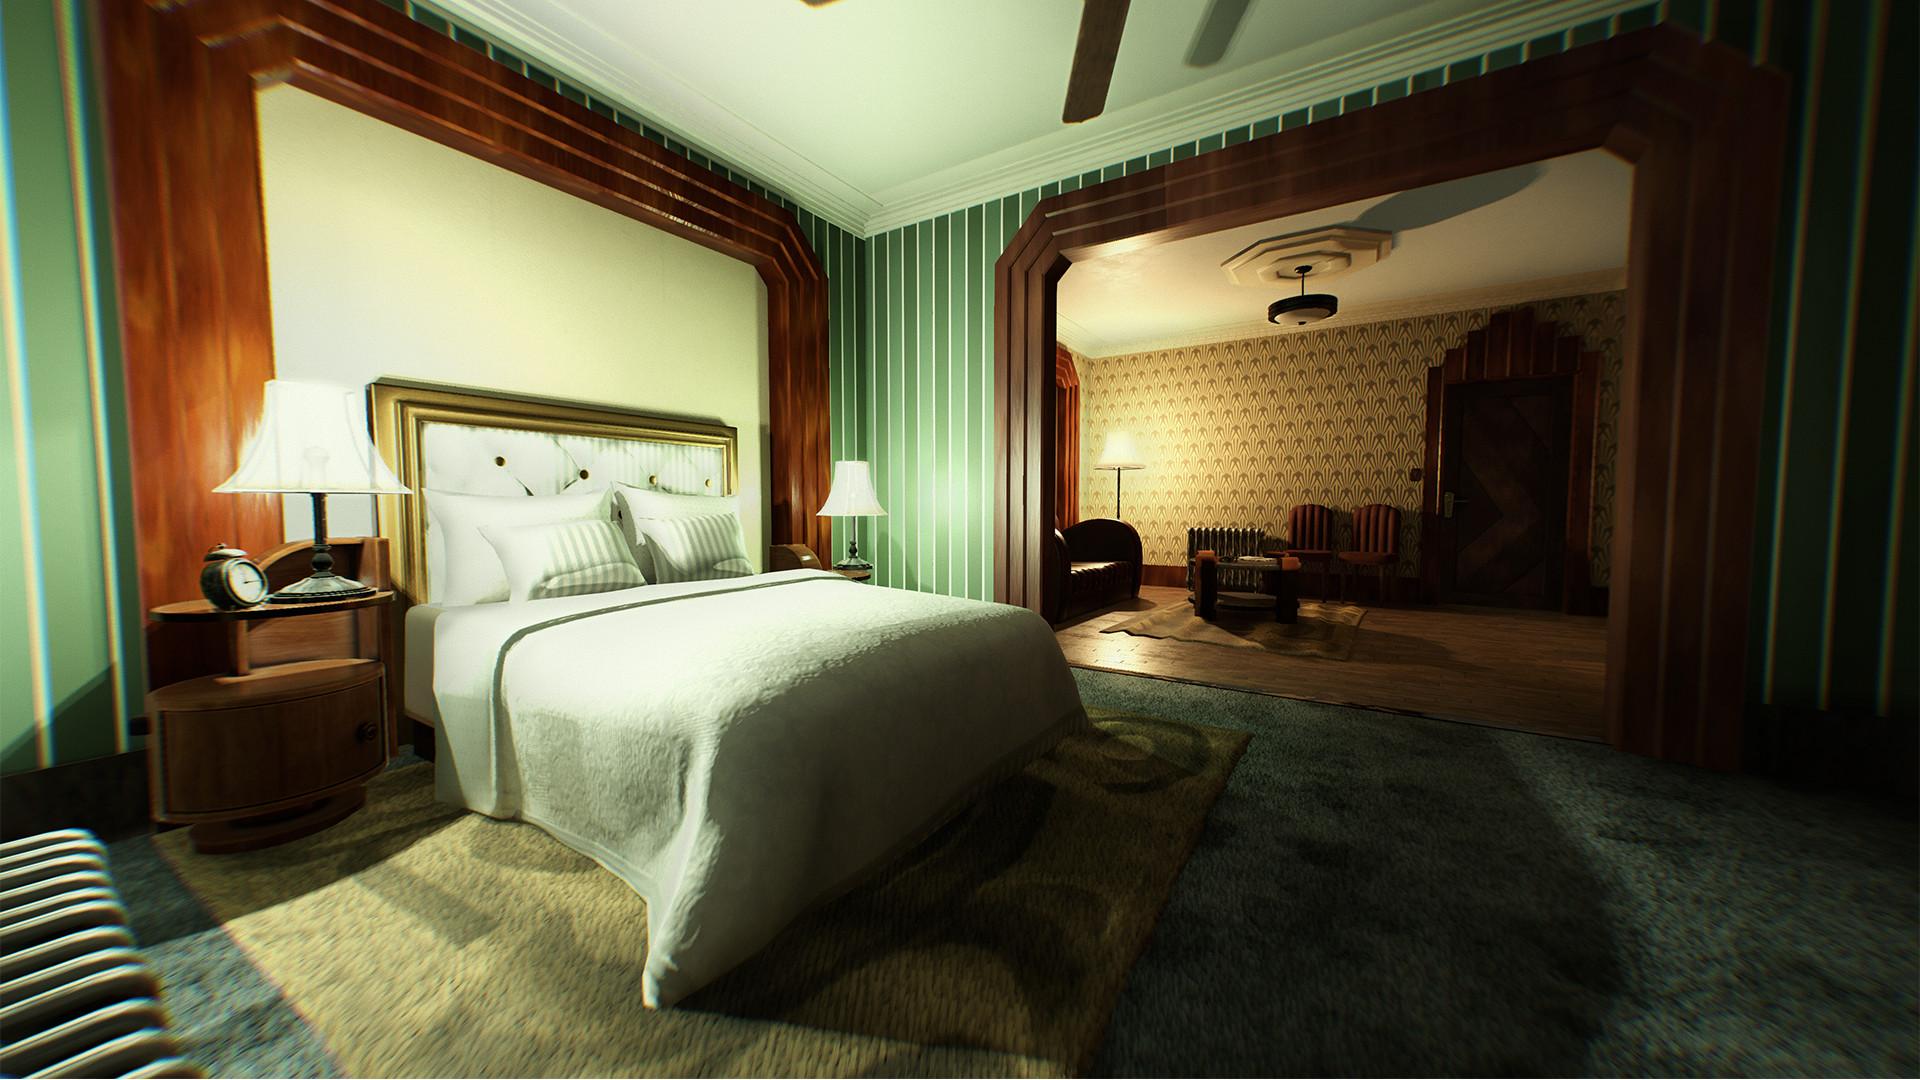 Augustin grassien bedroom 06